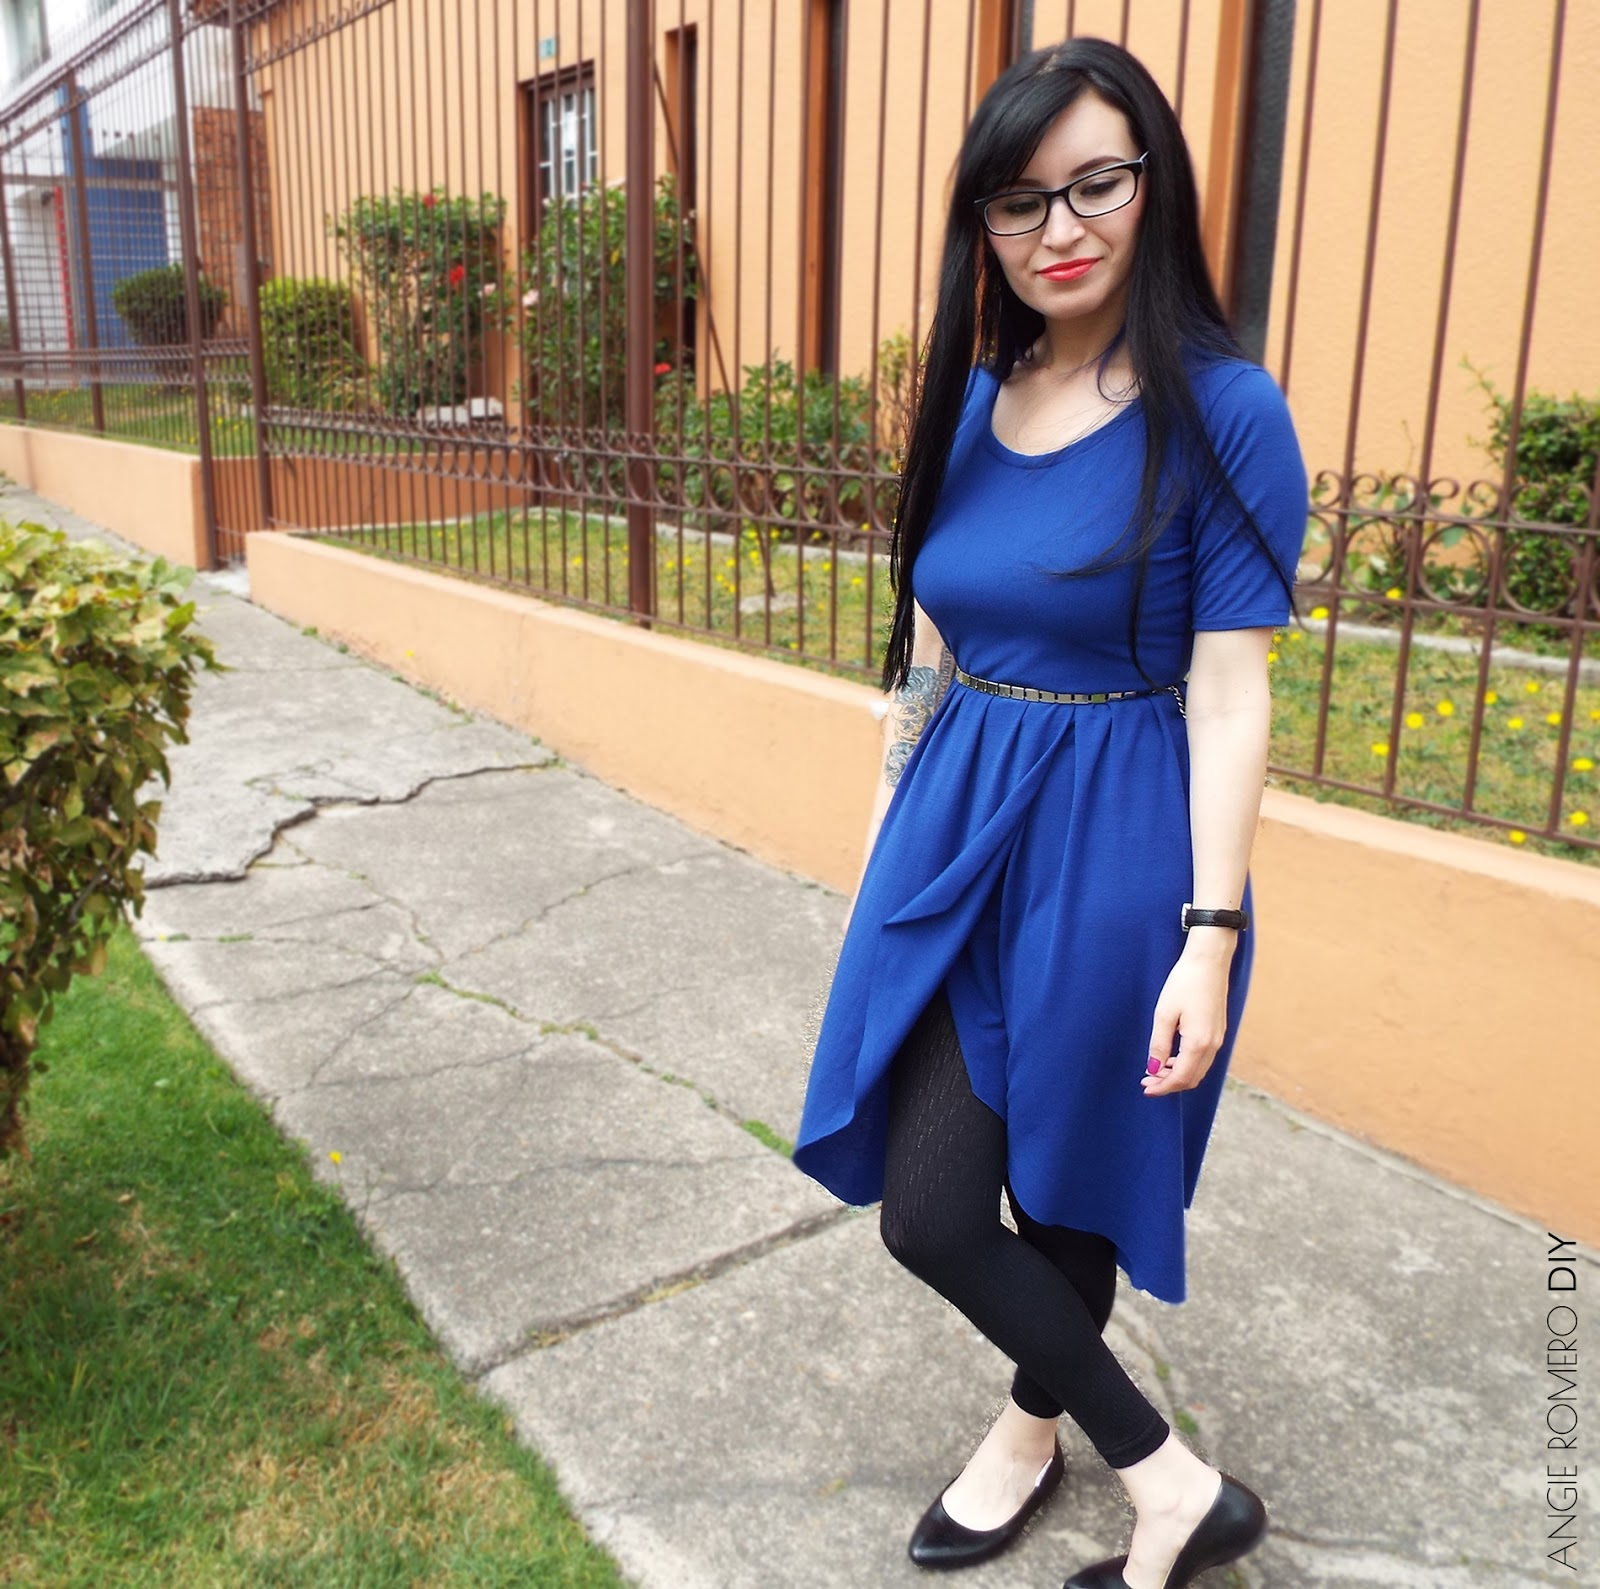 Como hacer vestido comodo para verano